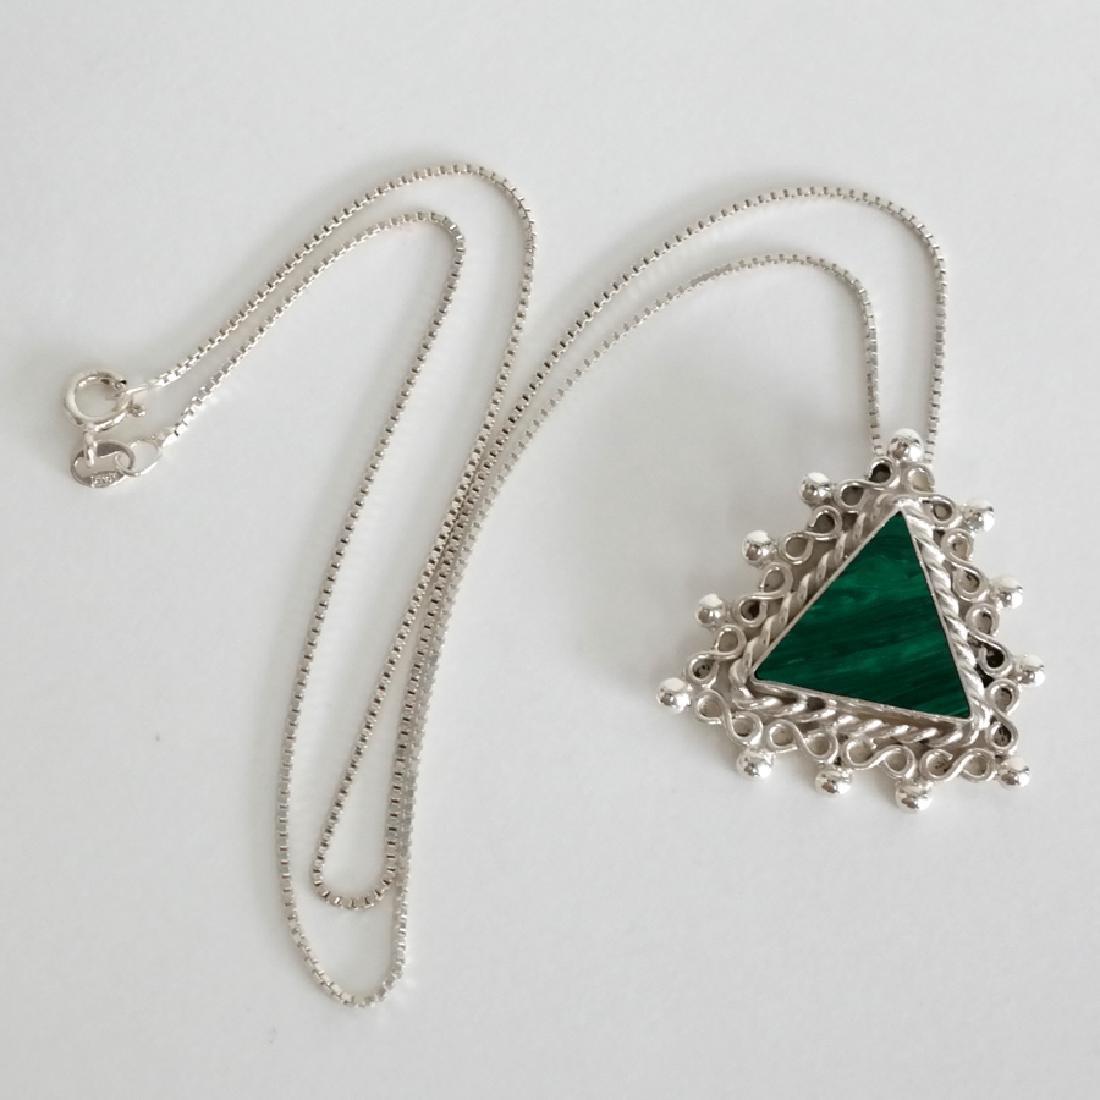 Sterling silver box chain and triangle shape malachite